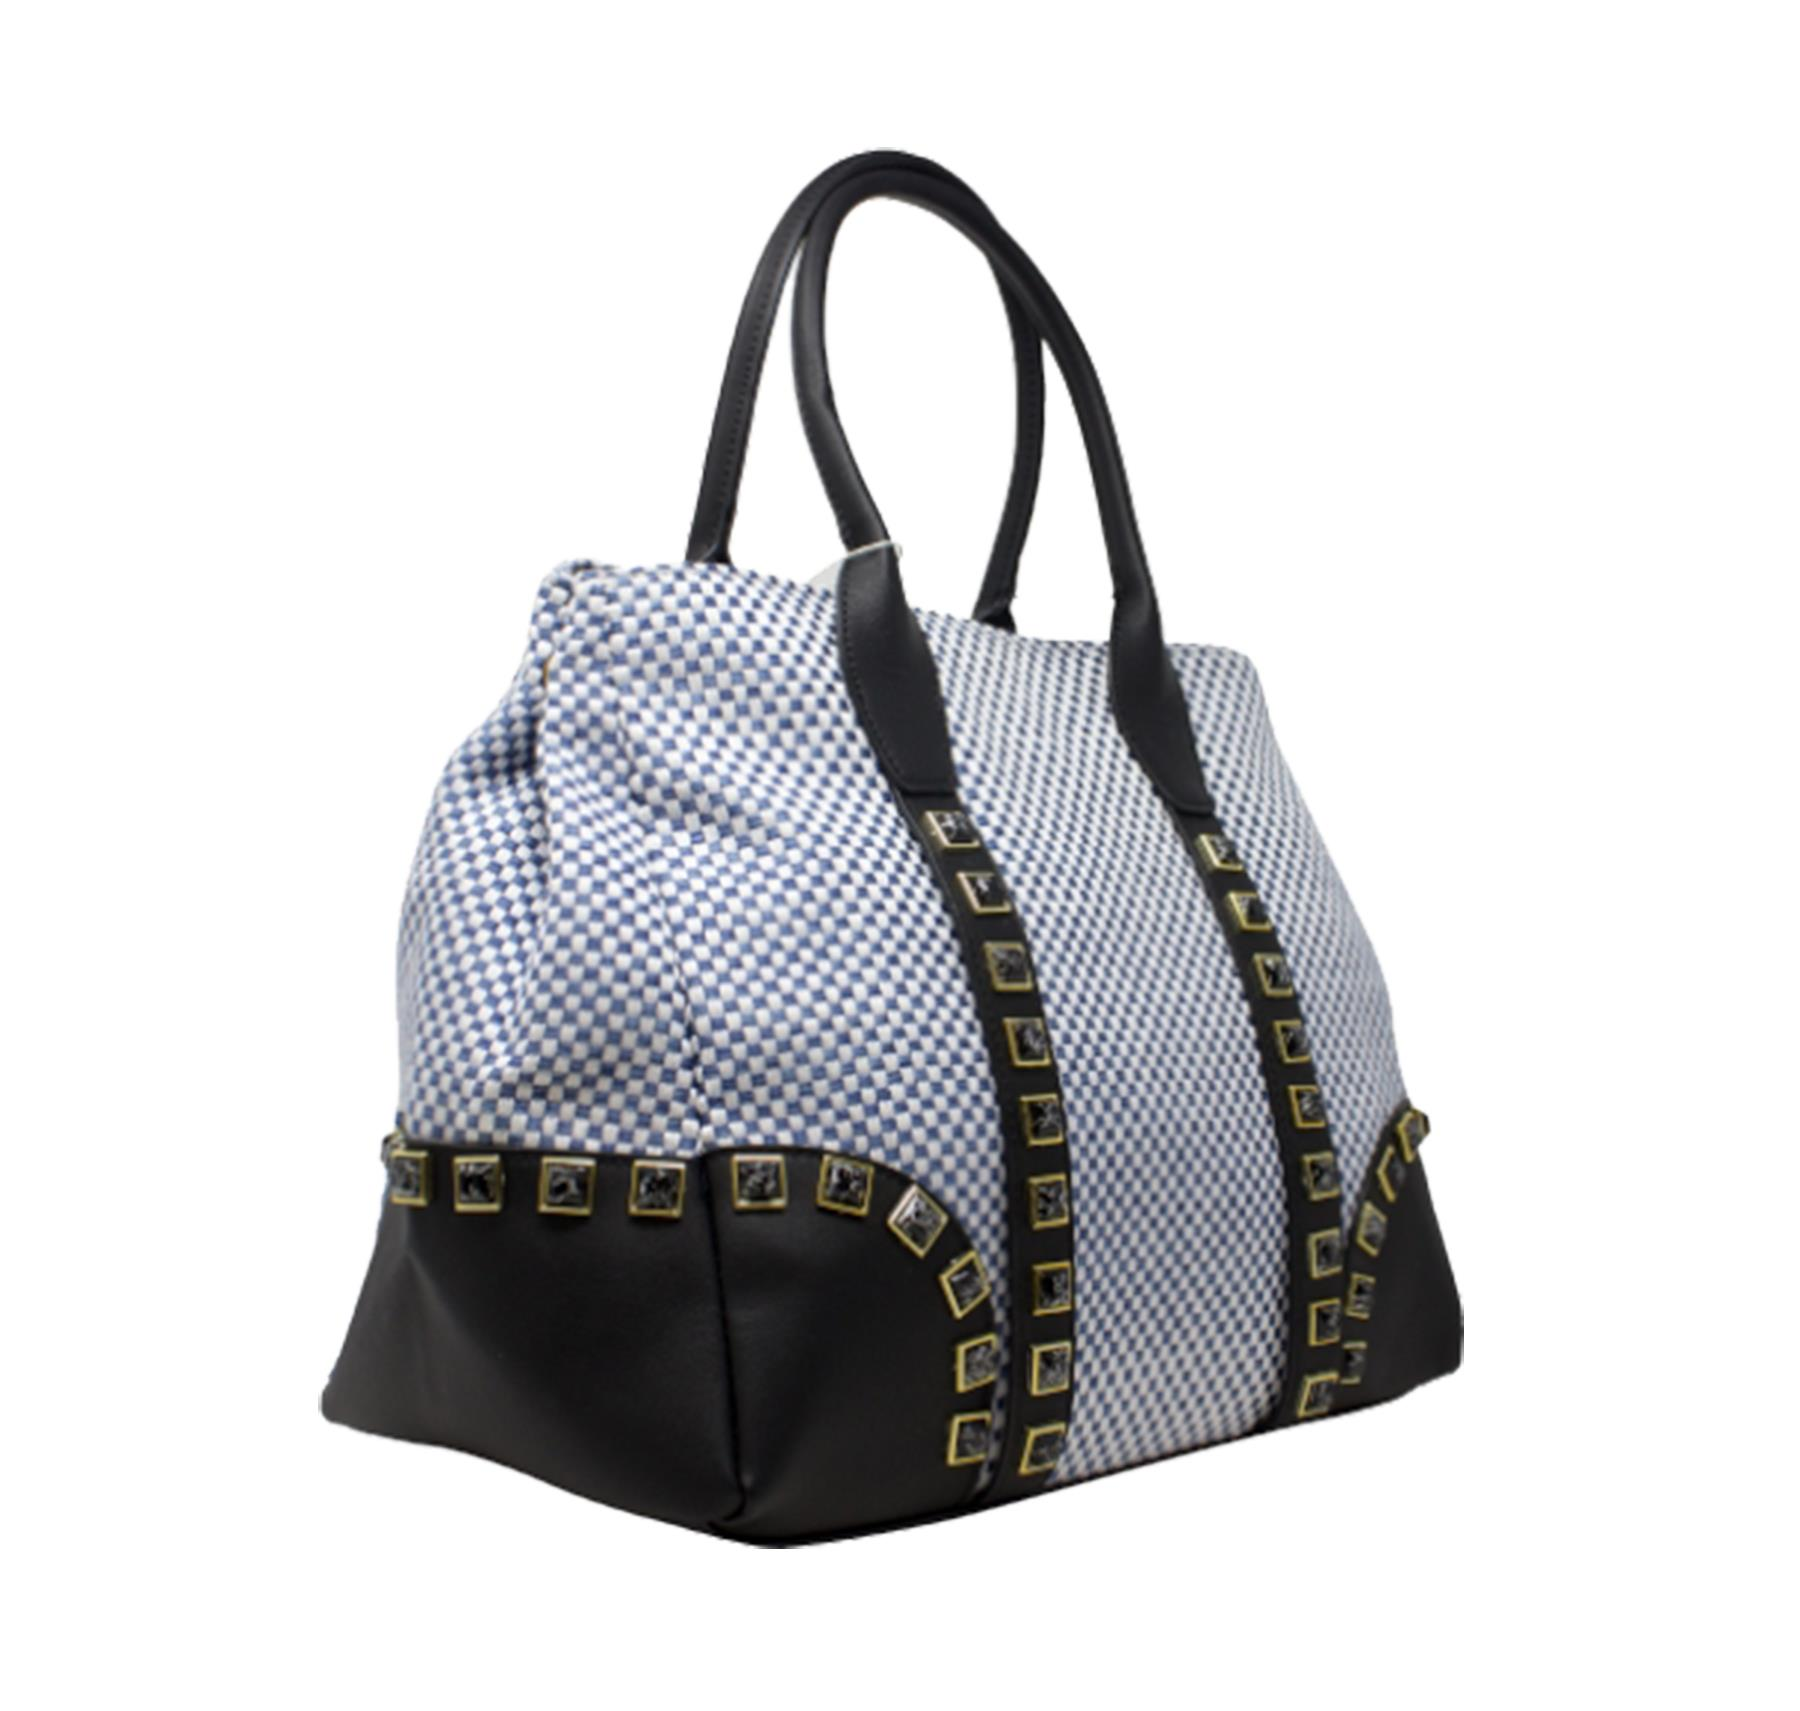 New-Women-s-Small-Check-Pattern-Studded-Design-Tote-Bag-Handbag thumbnail 9